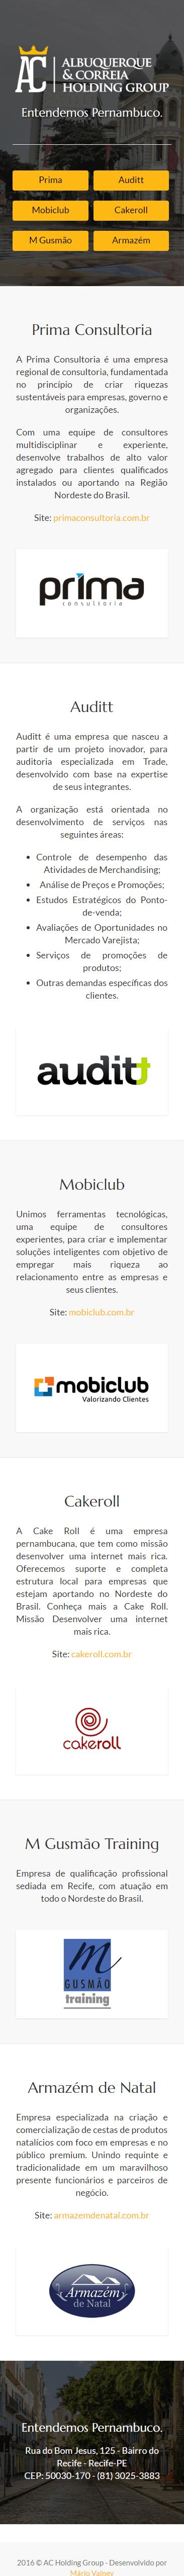 achg-mobile